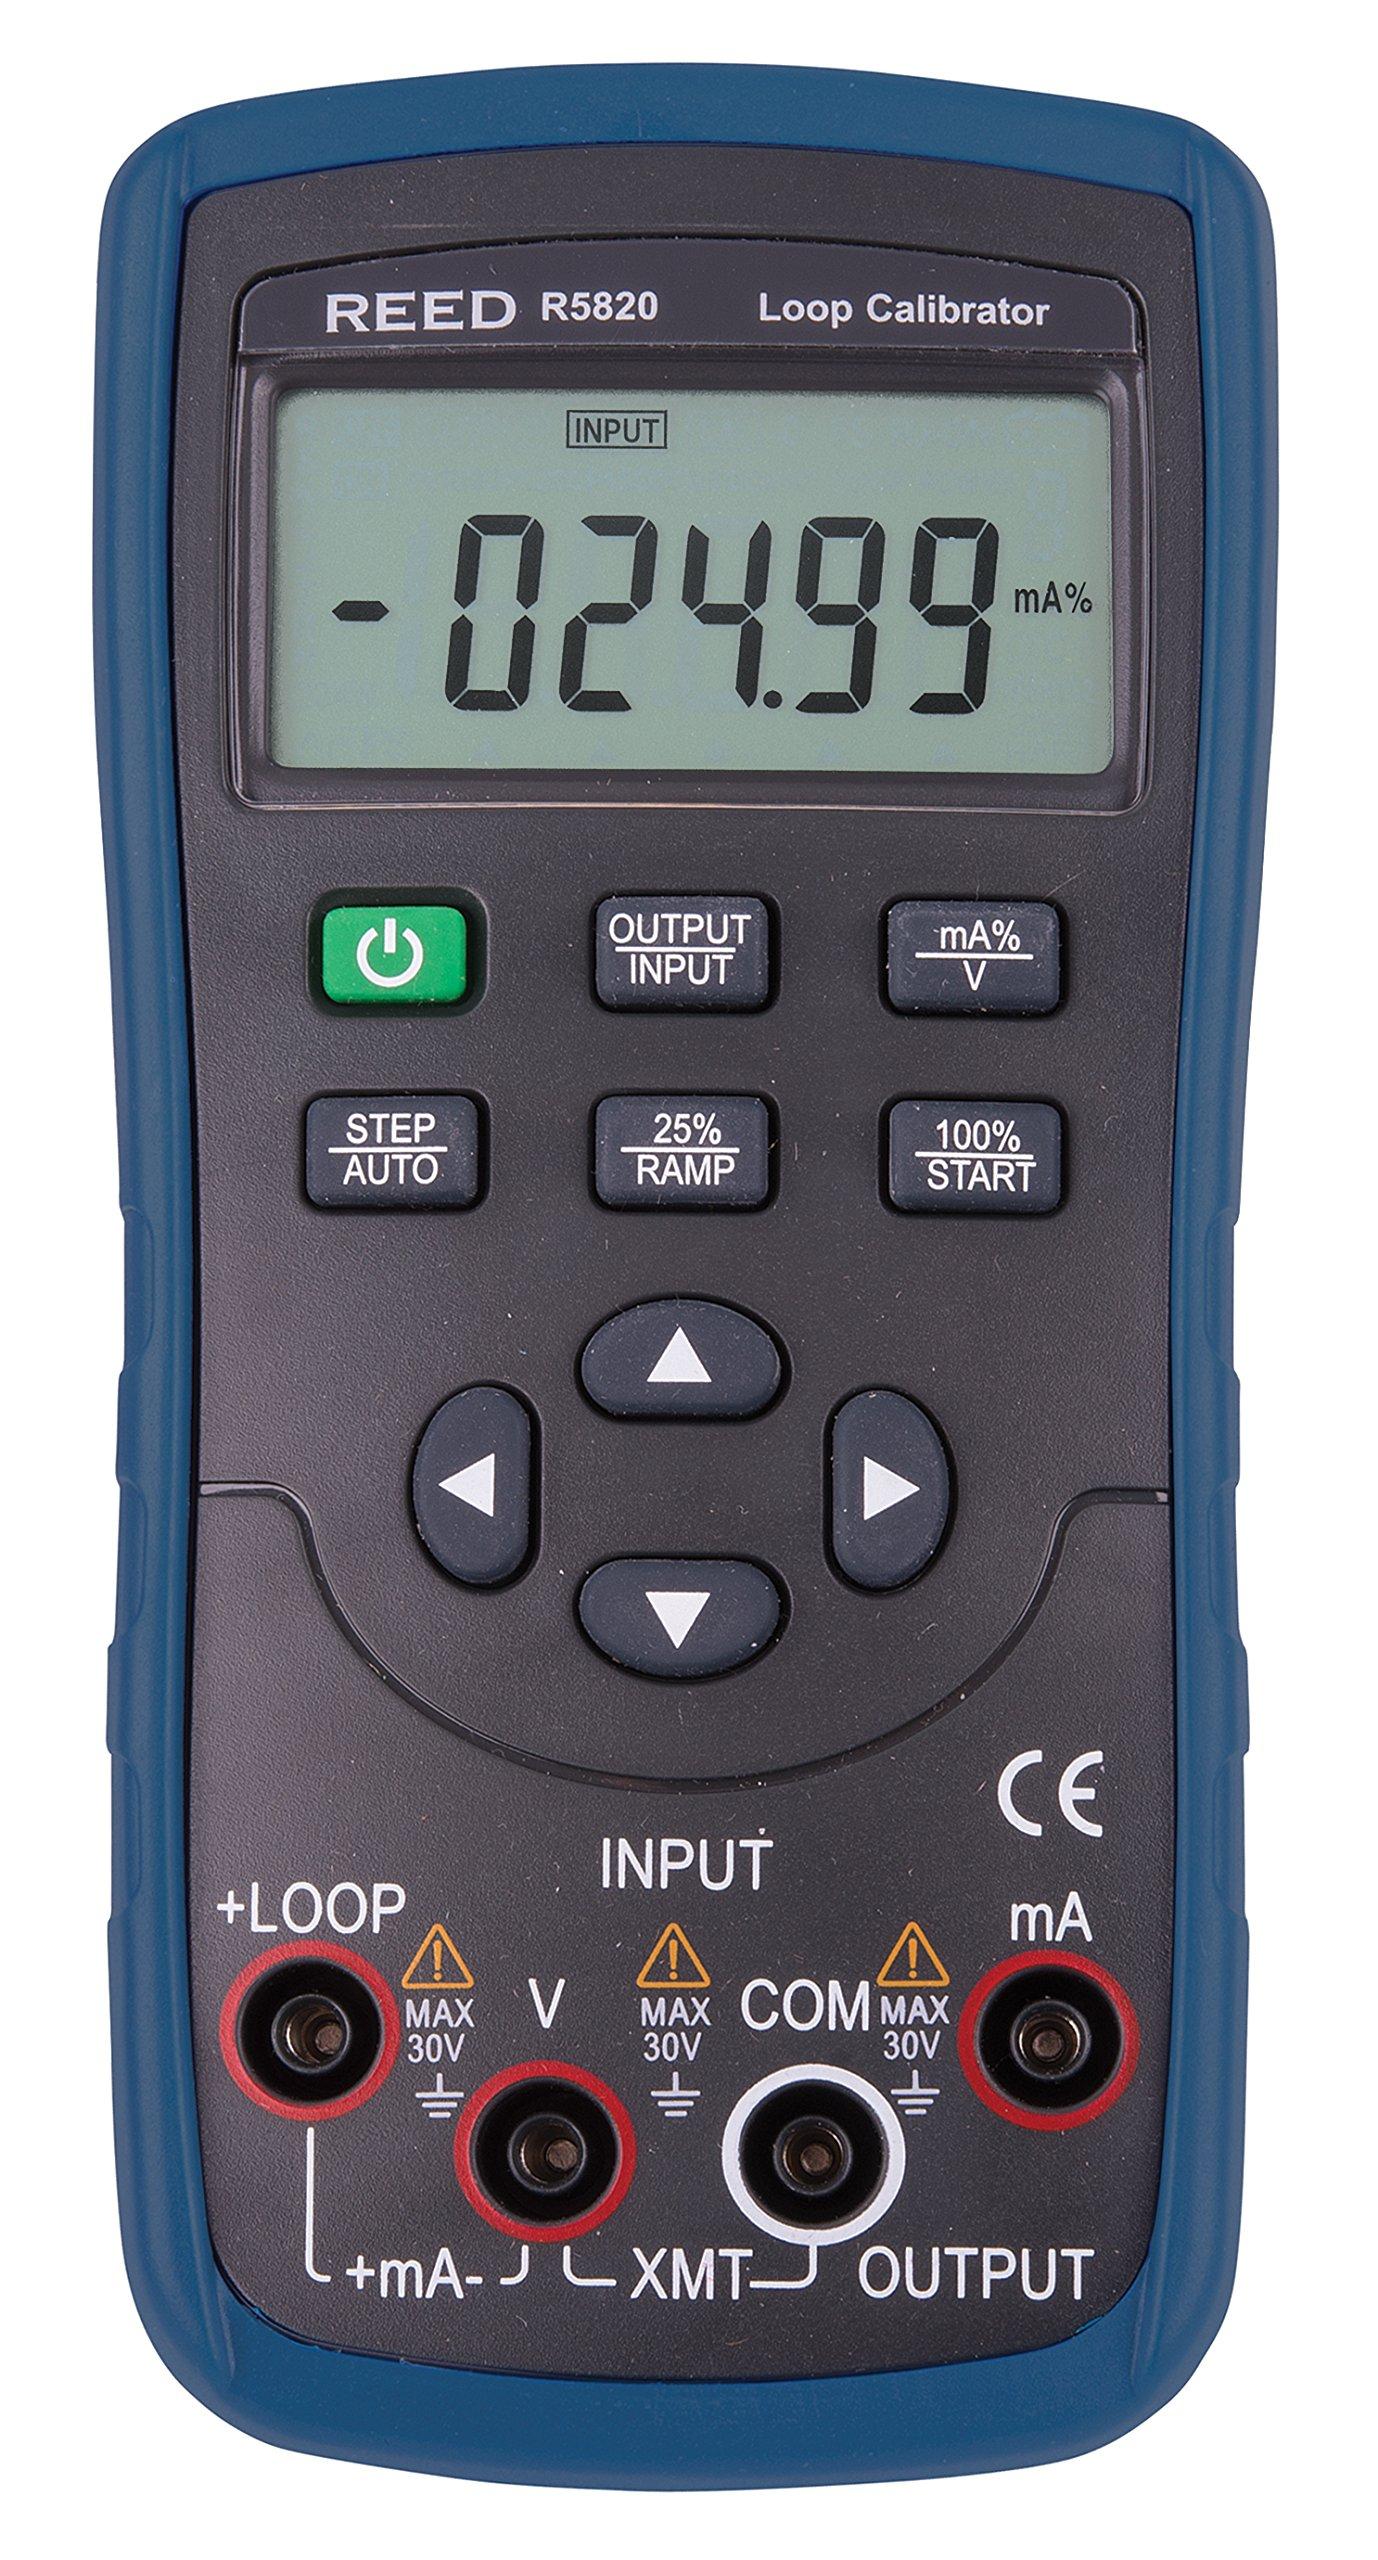 REED Instruments R5820 (VC05) Loop Calibrator